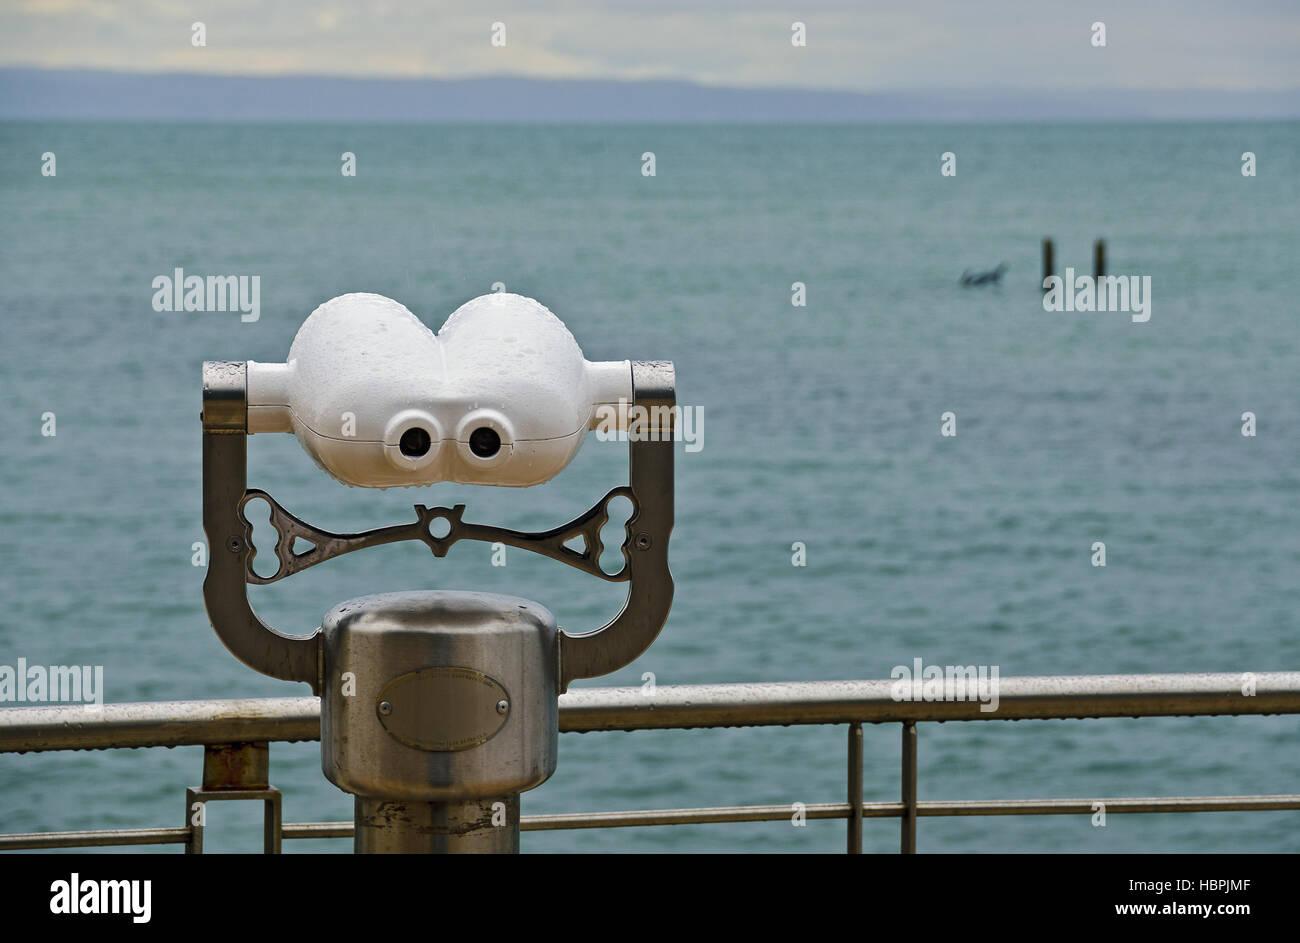 coin-operated binocular - Stock Image